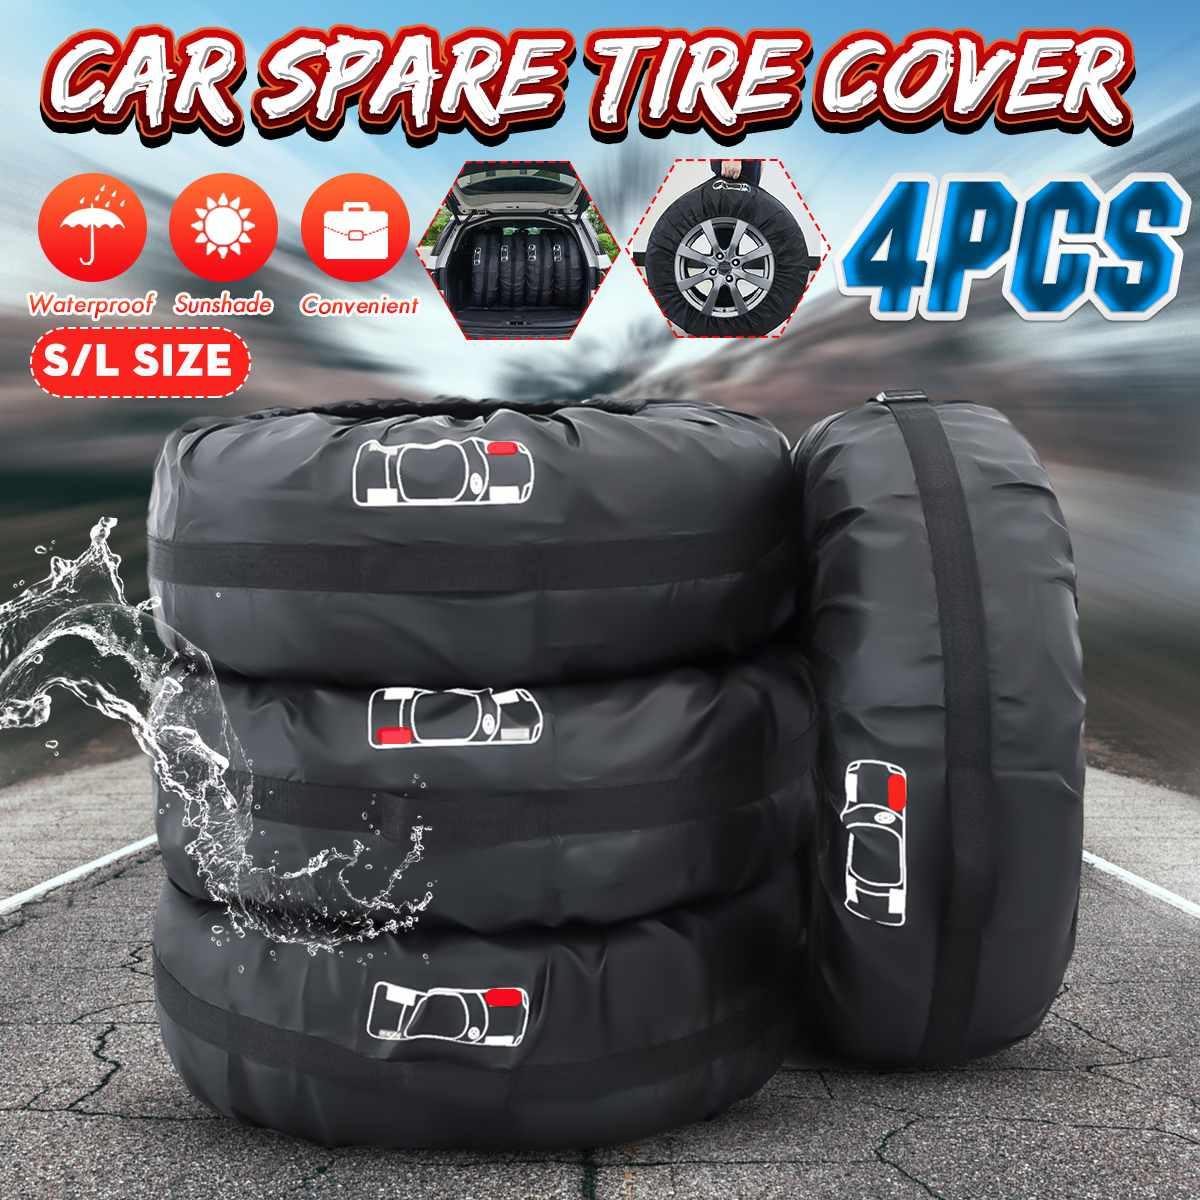 Universal 4Pcs S/L Mobil Ban Cadangan Cover Case Poliester Ban Penyimpanan Tas Carrier Auto Roda Ban Pelindung tahan Debu Tahan Air